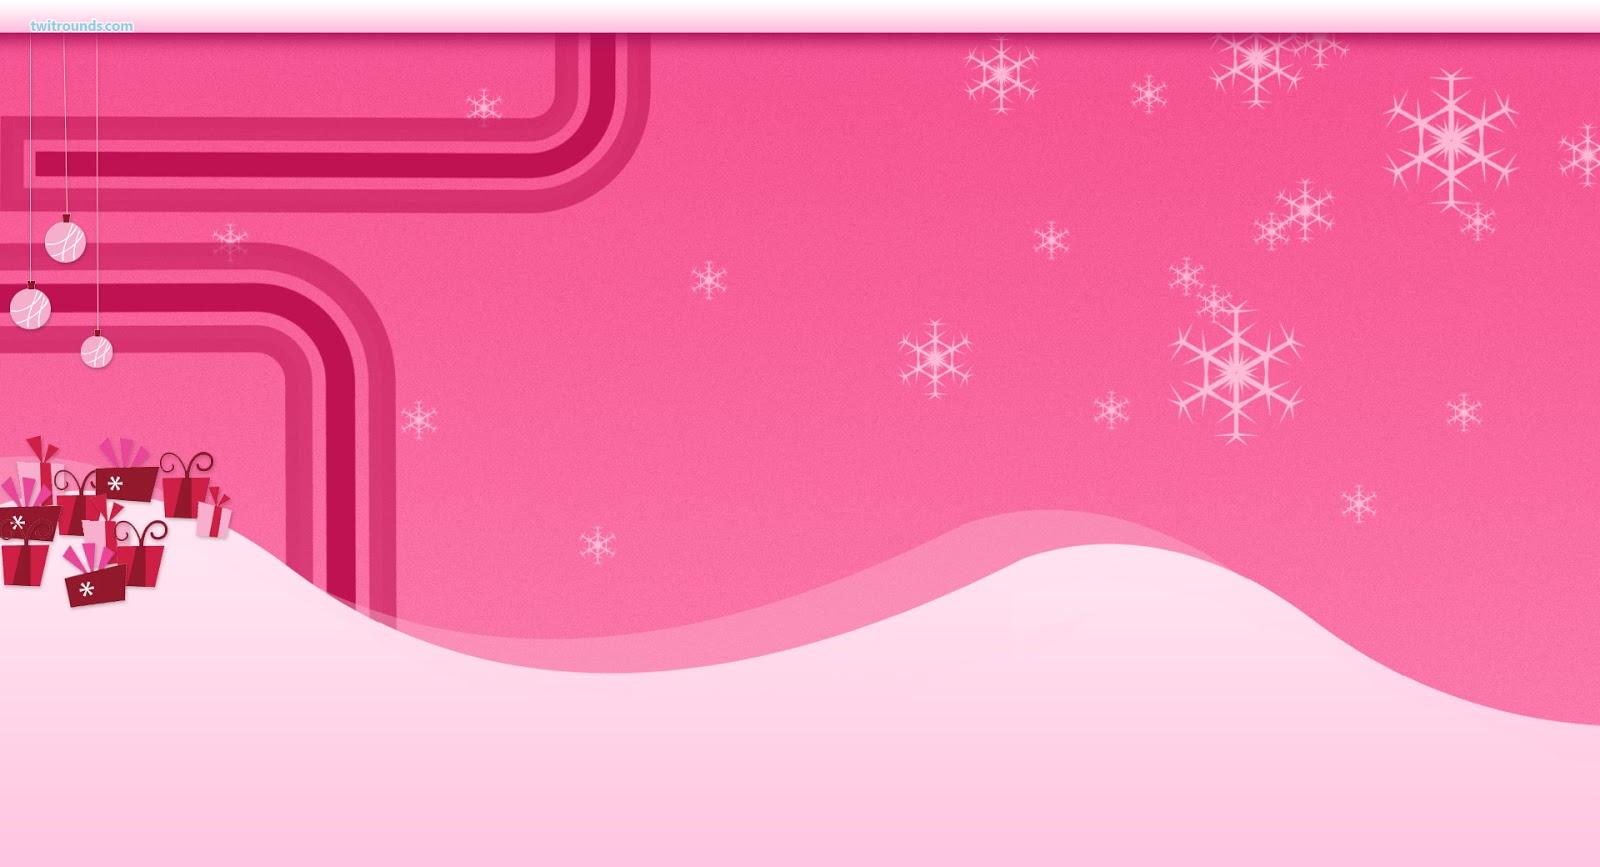 Pink Beautiful Girly WallpaperPink Girly Wallpaper